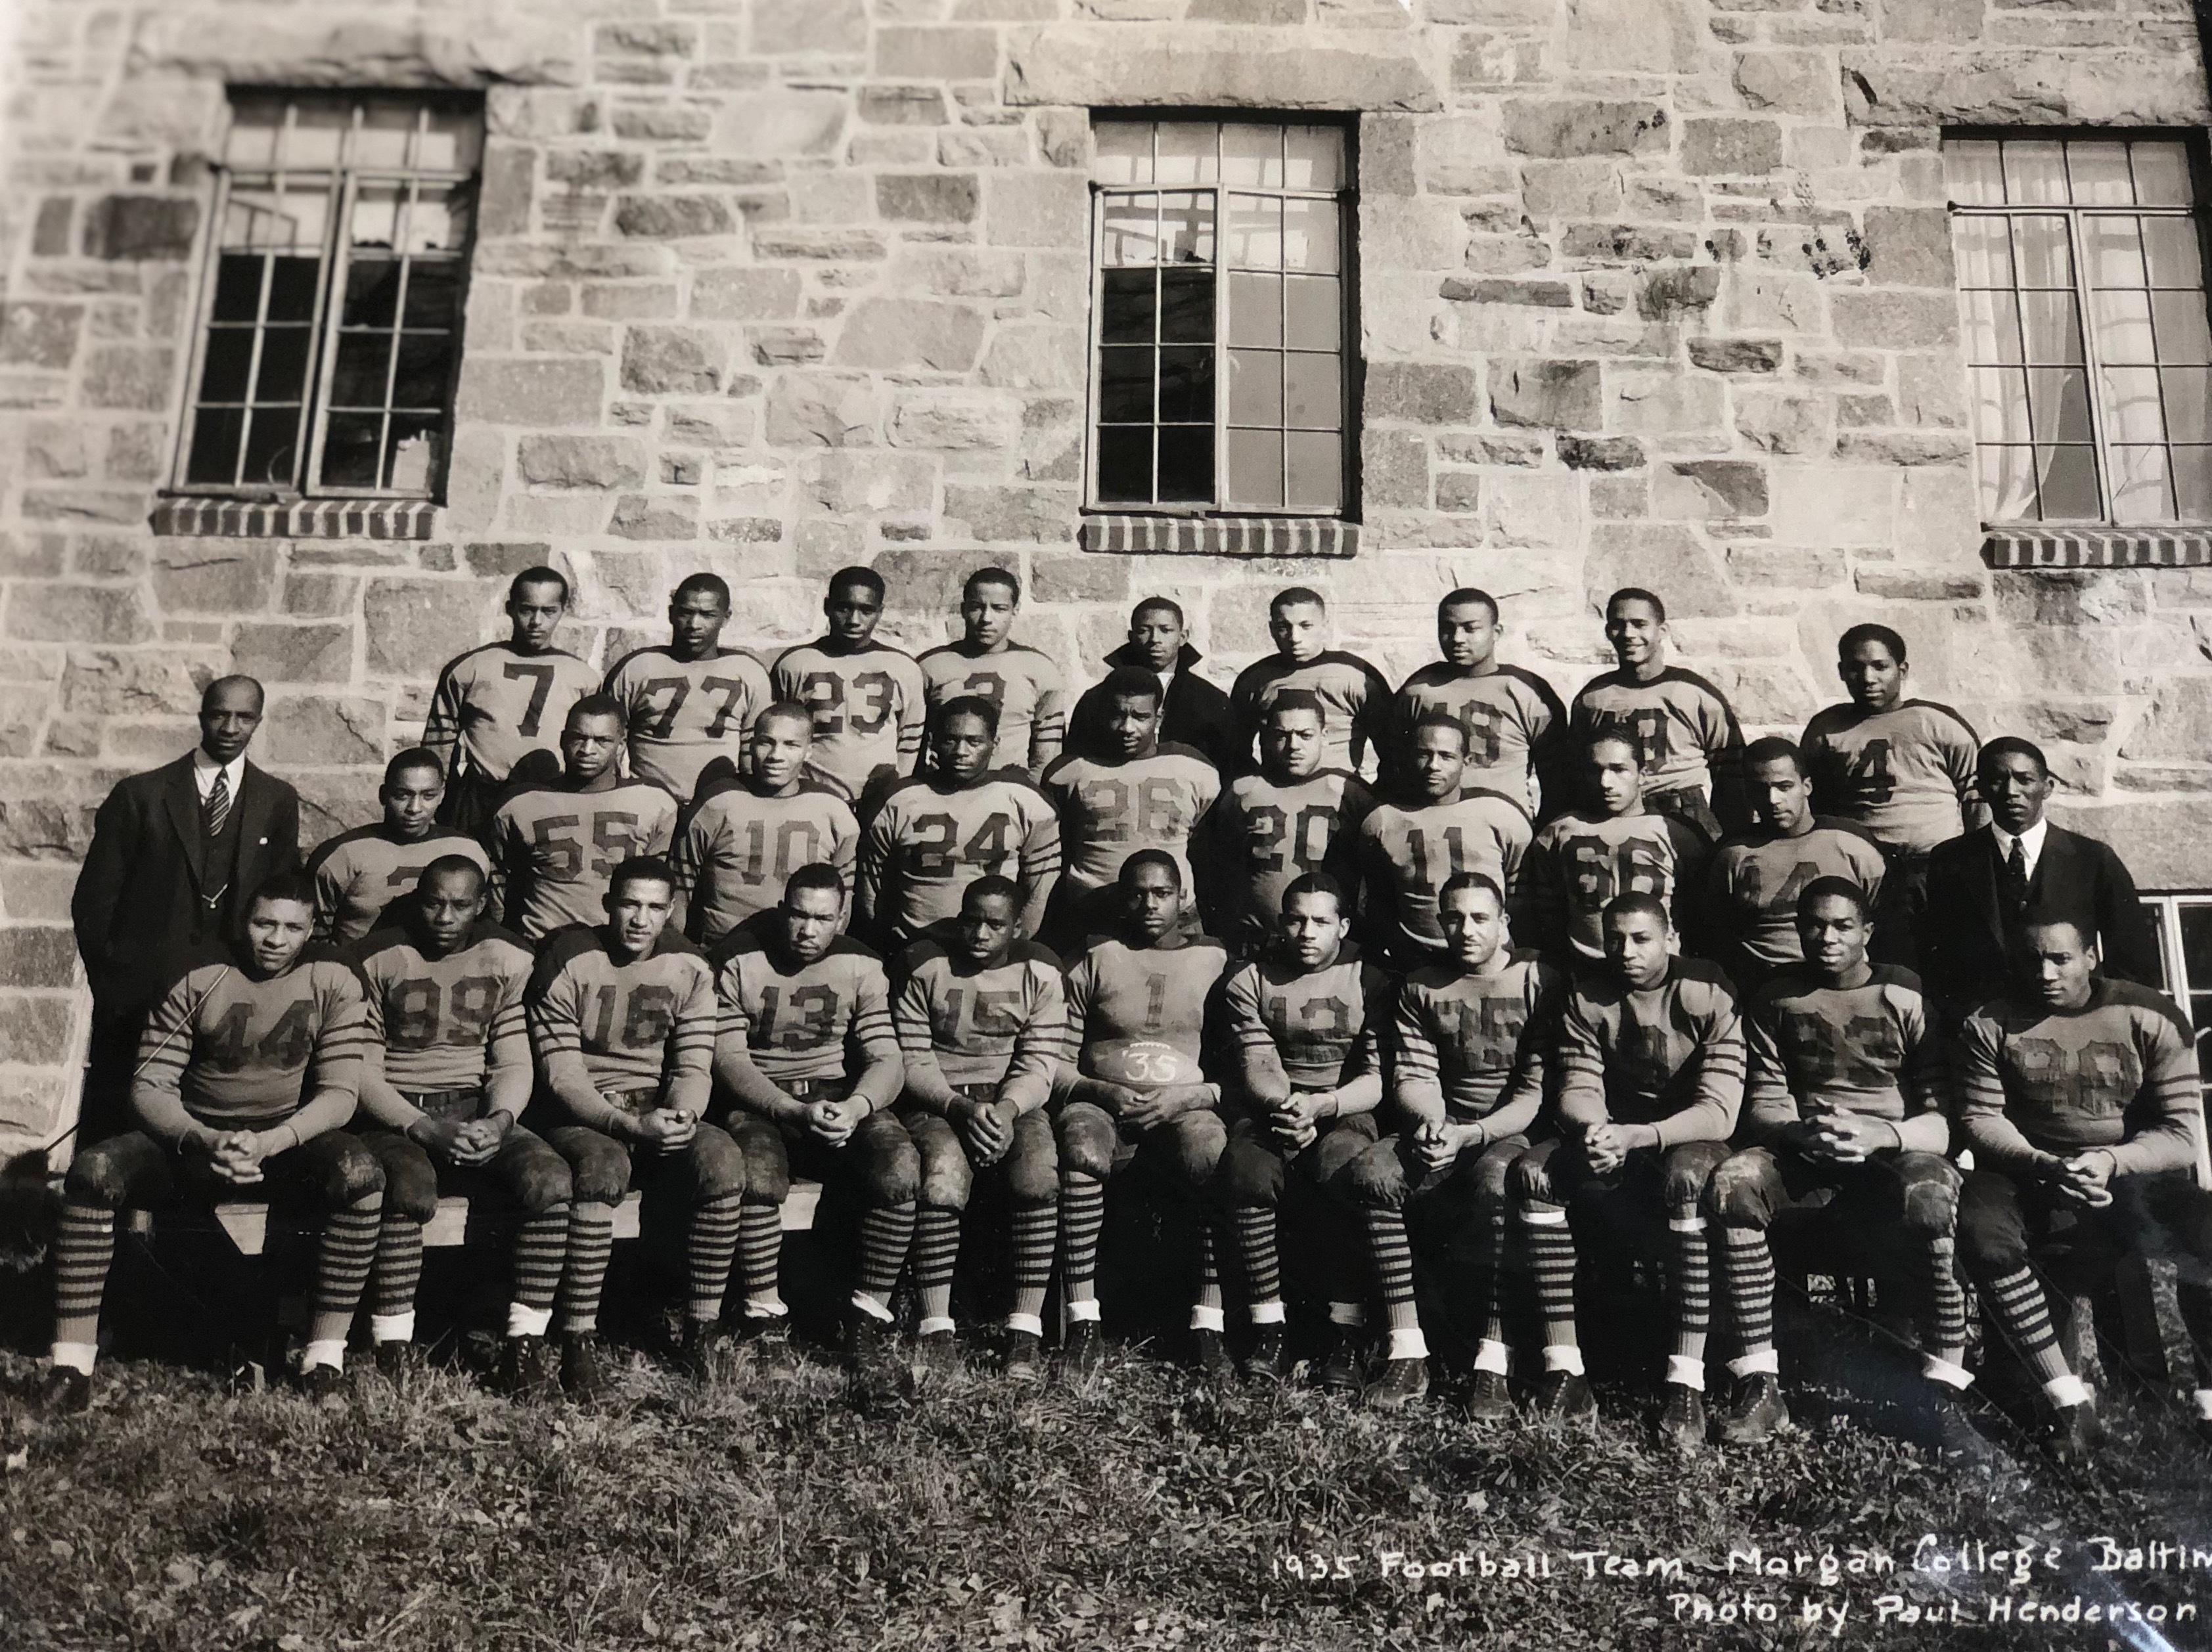 1935footballteam